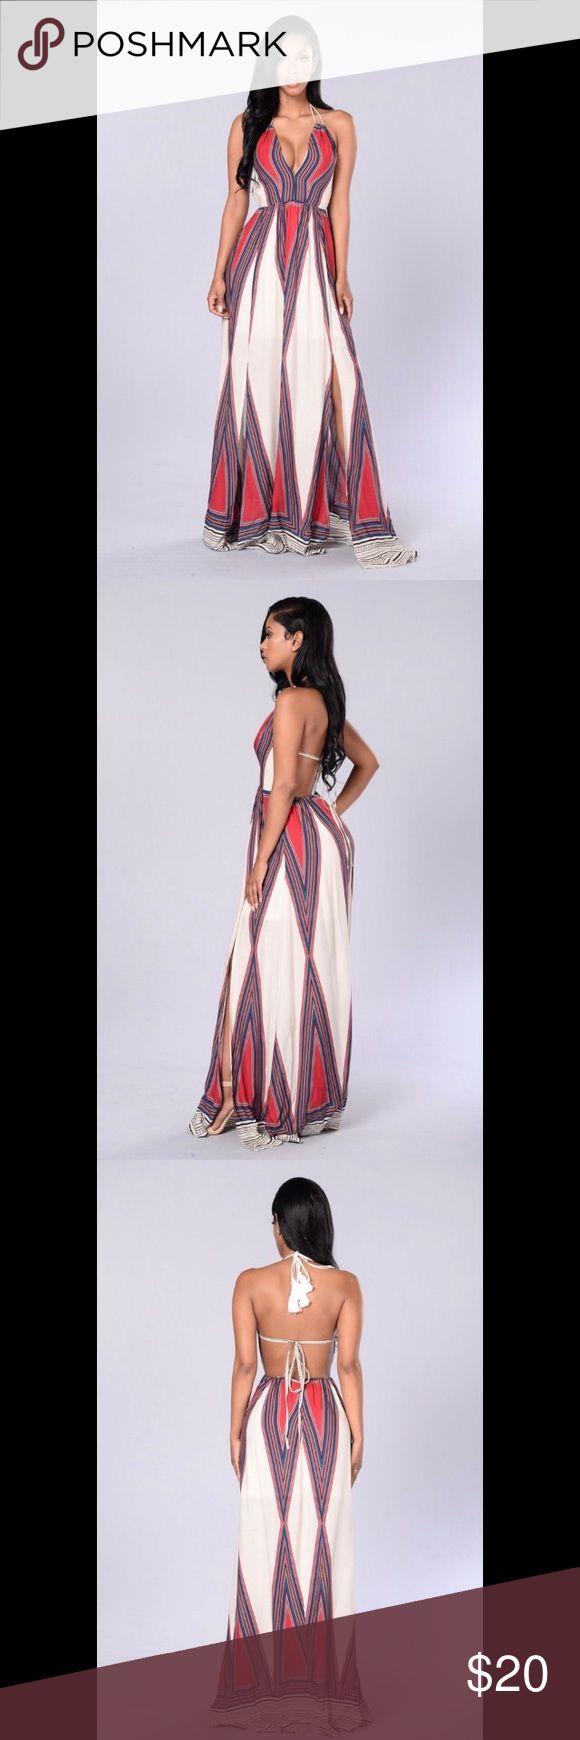 "💃Fashion Nova Spoil Me Tribal Maxi Dress Ivory💃 ""Spoil Me"" elegant maxi dress in the color Ivory, size M from Fashion Nova. Used, shows no signs of wear. Fashion Nova Dresses Maxi"